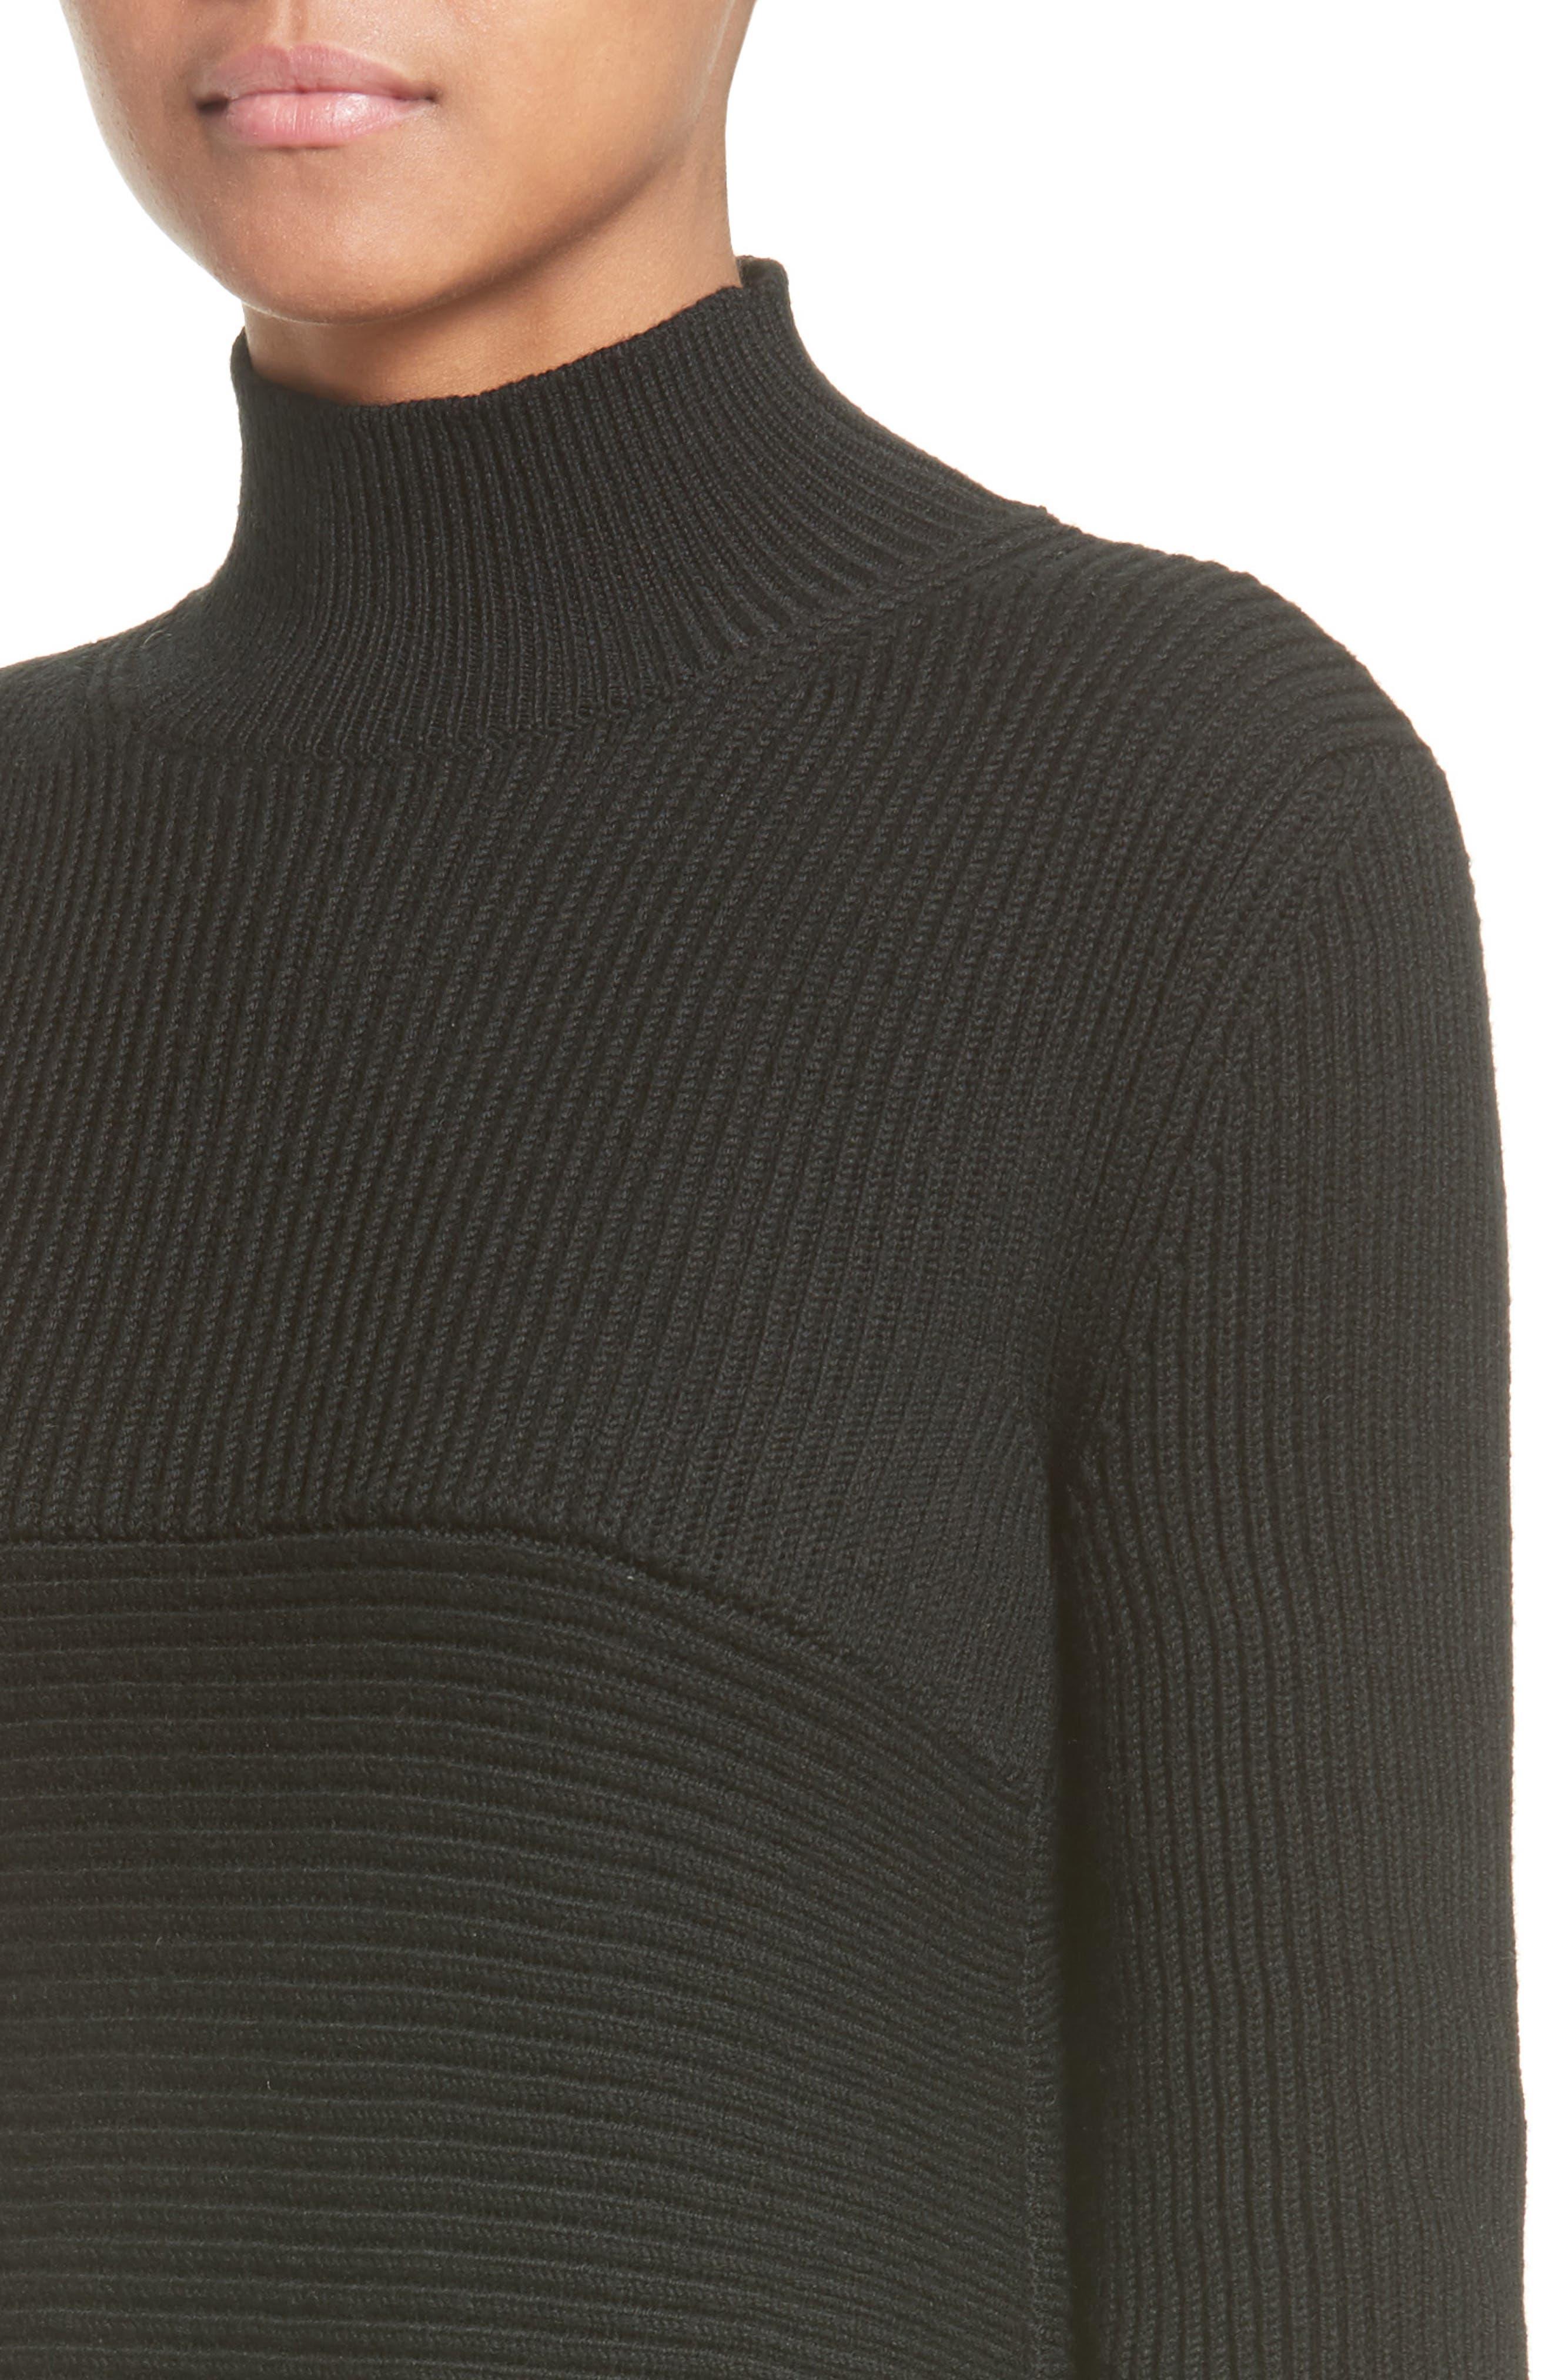 Virgin Wool Rib Knit Dress,                             Alternate thumbnail 4, color,                             001